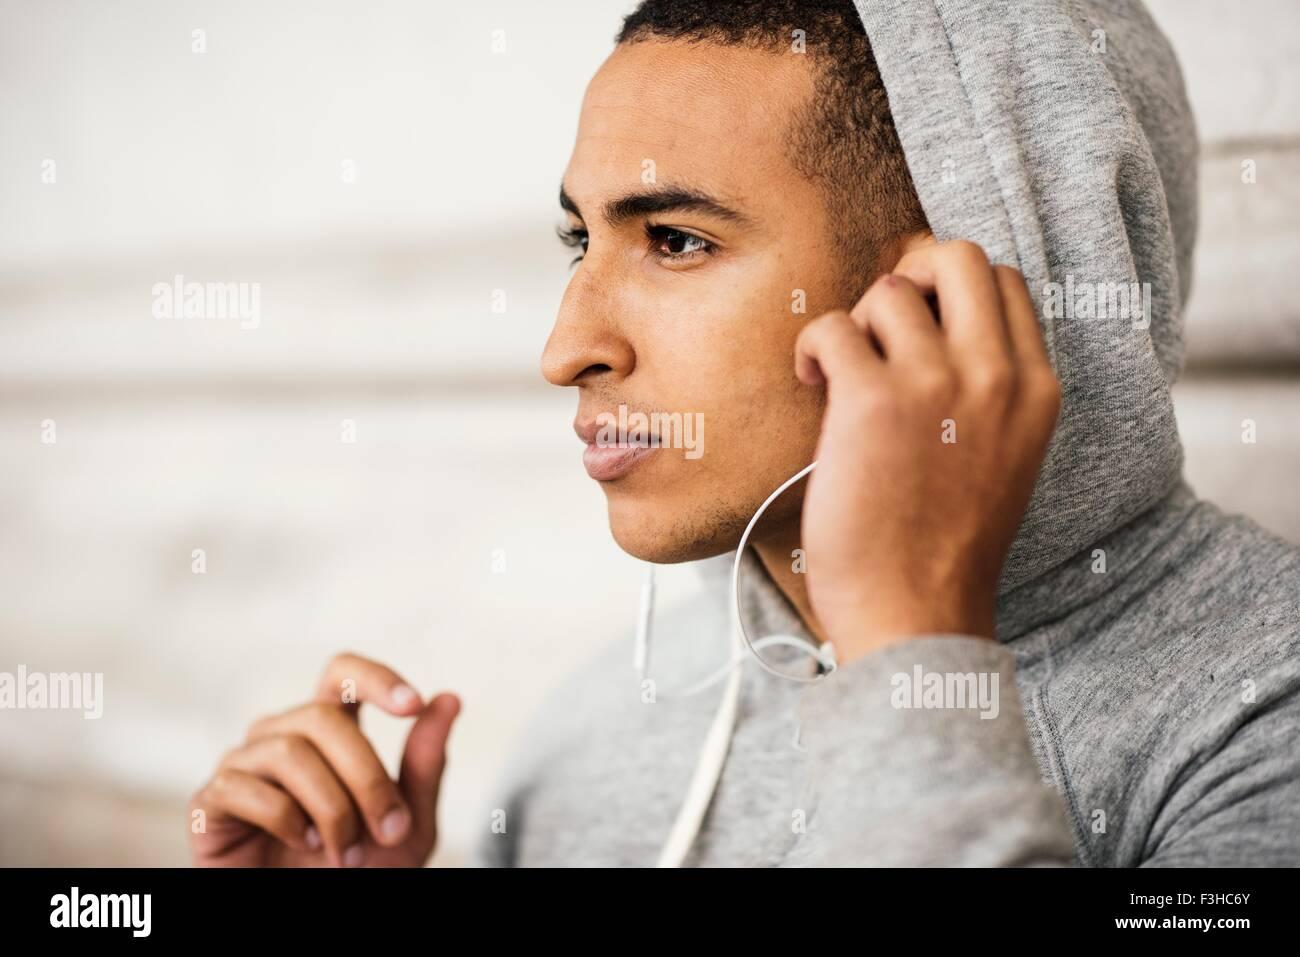 Male runner wearing grey hoody listening to earphone music - Stock Image